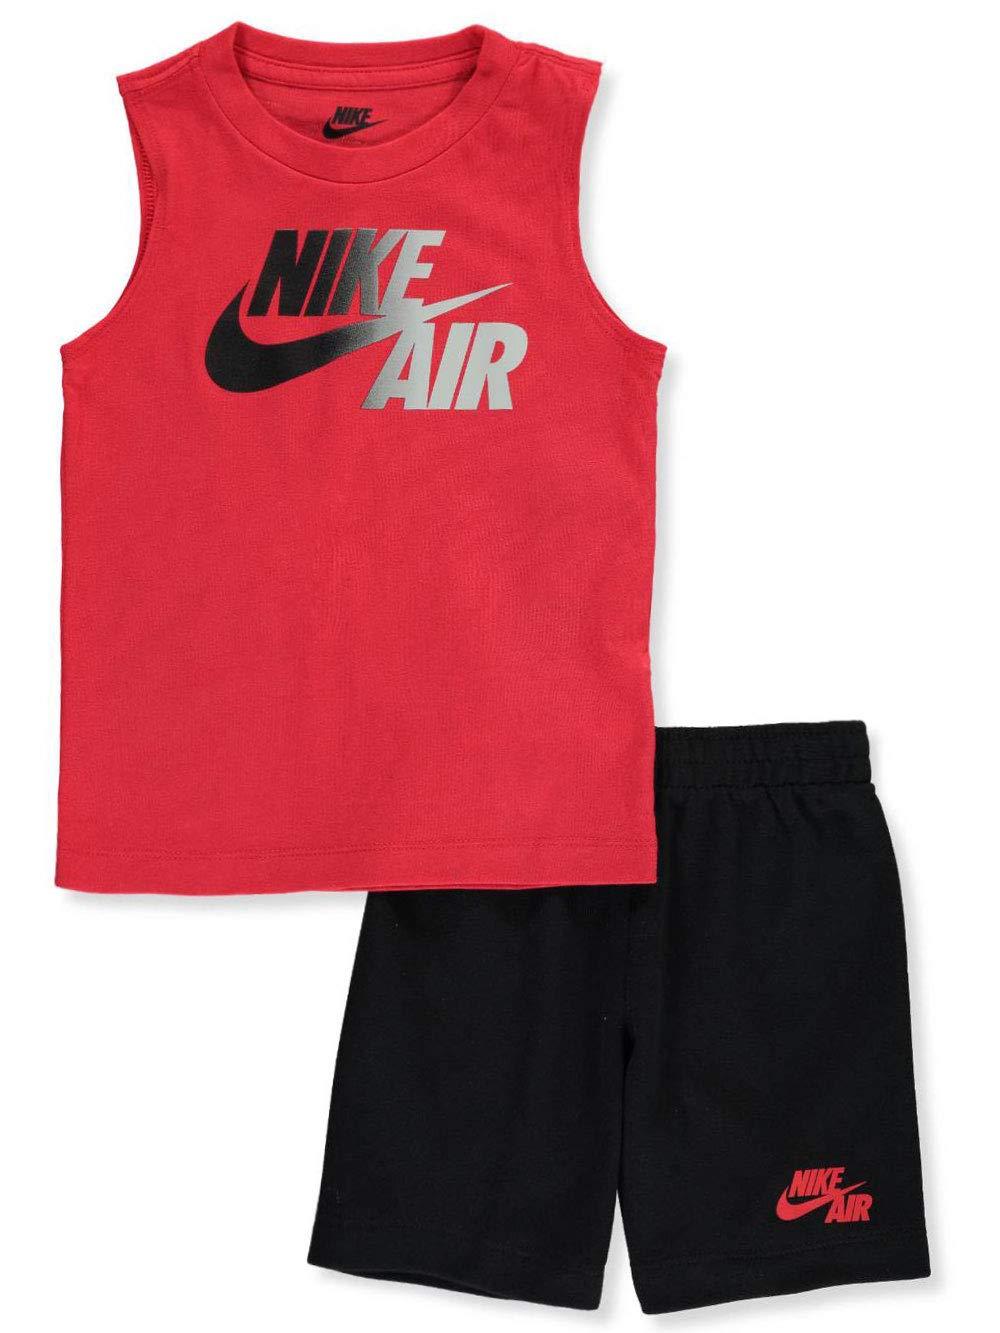 Nike Boys' 2-Piece Shorts Set Outfit - Black/University red, 7